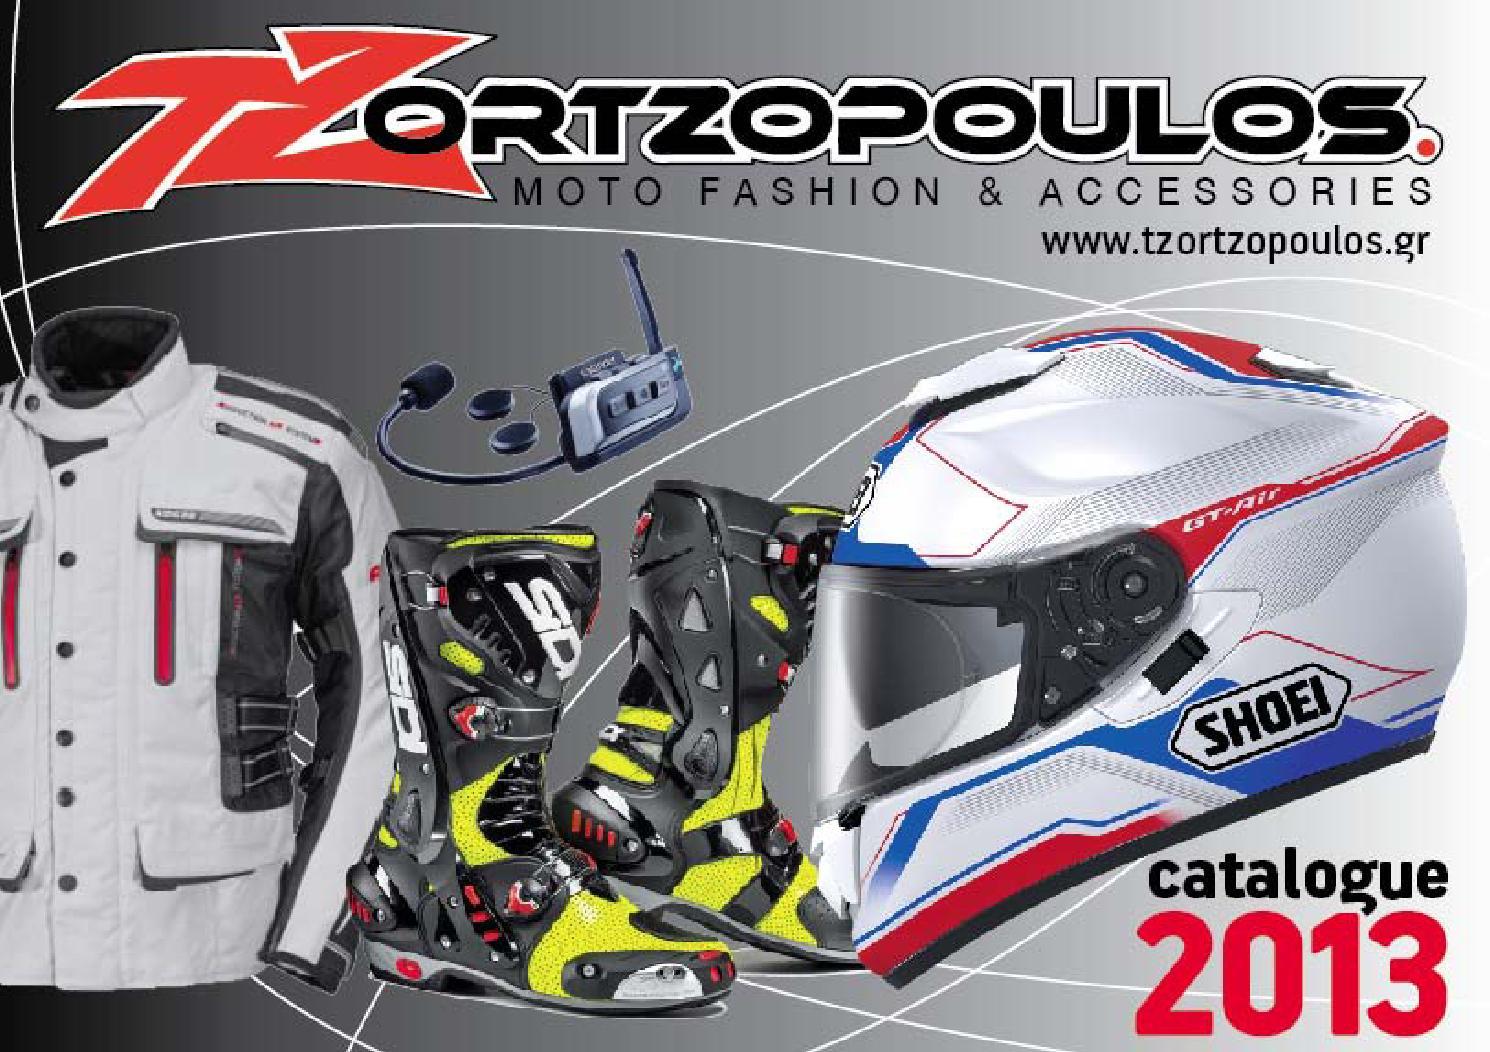 Tzortzopoulos Moto Fashion Catalogue 2013 by stat tzortzopoulos - issuu 26bfb3866e6